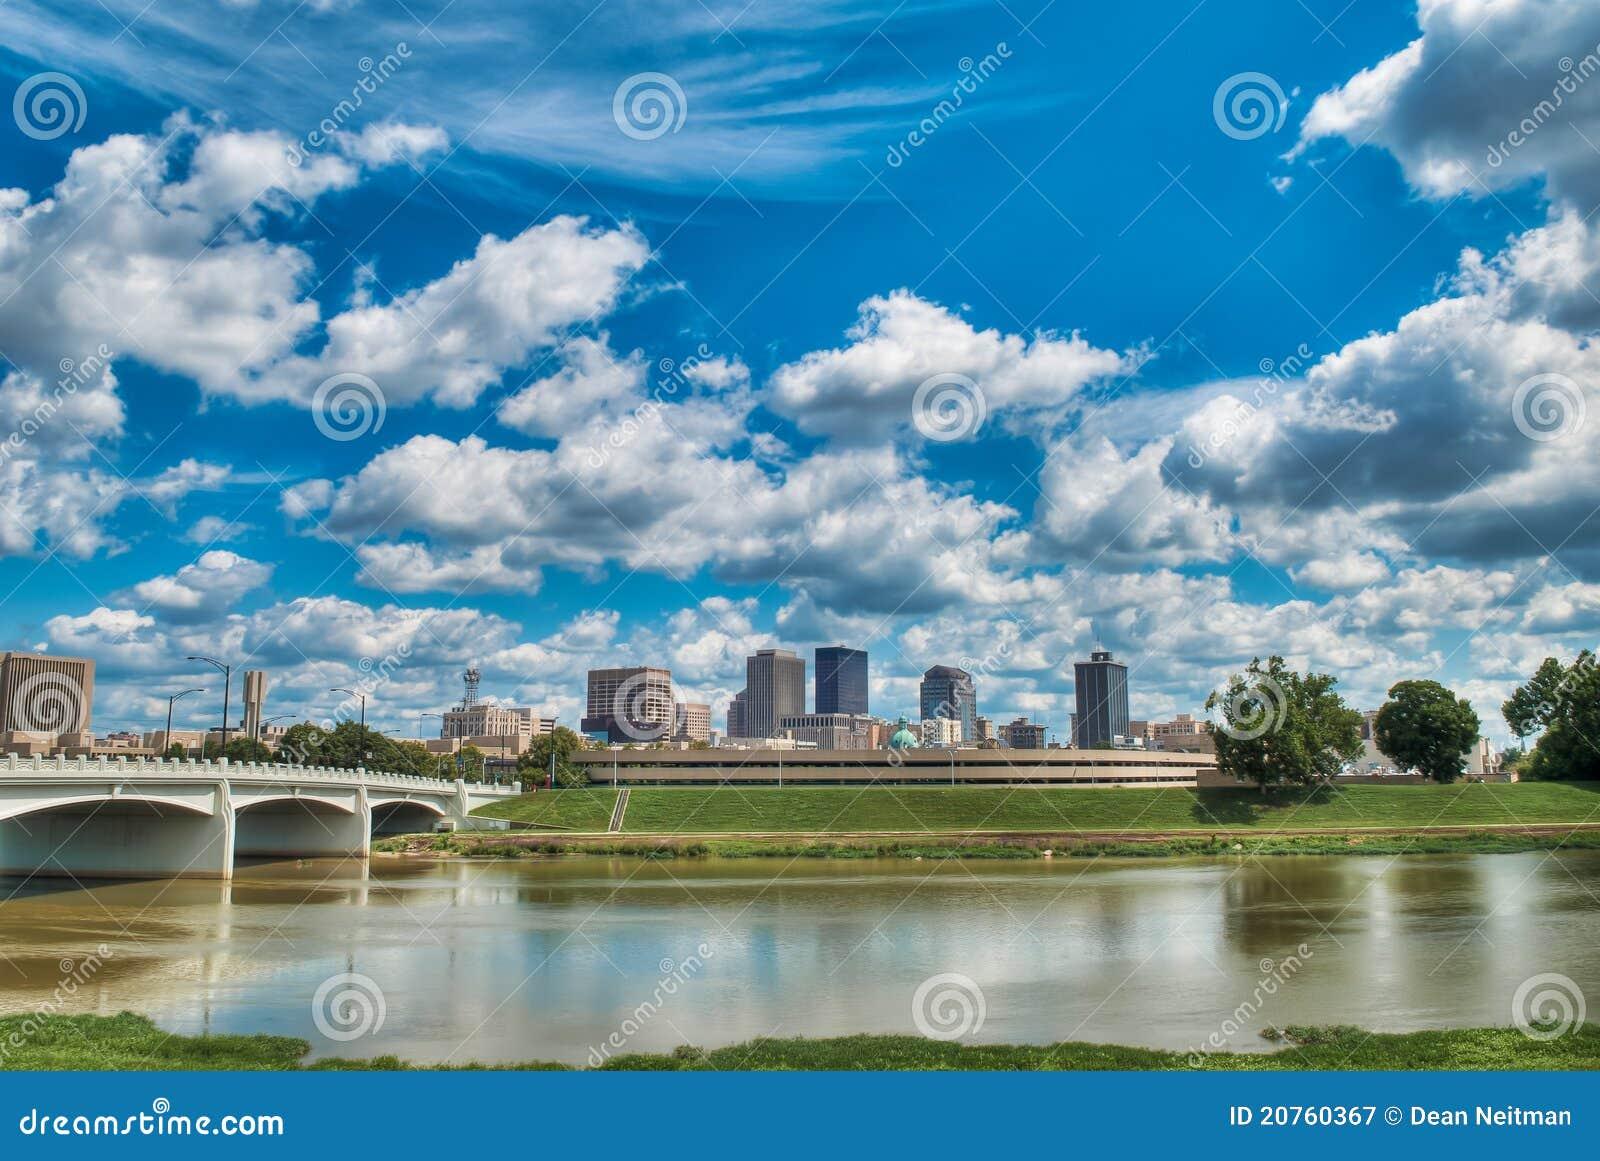 Dayton Ohio Skyline